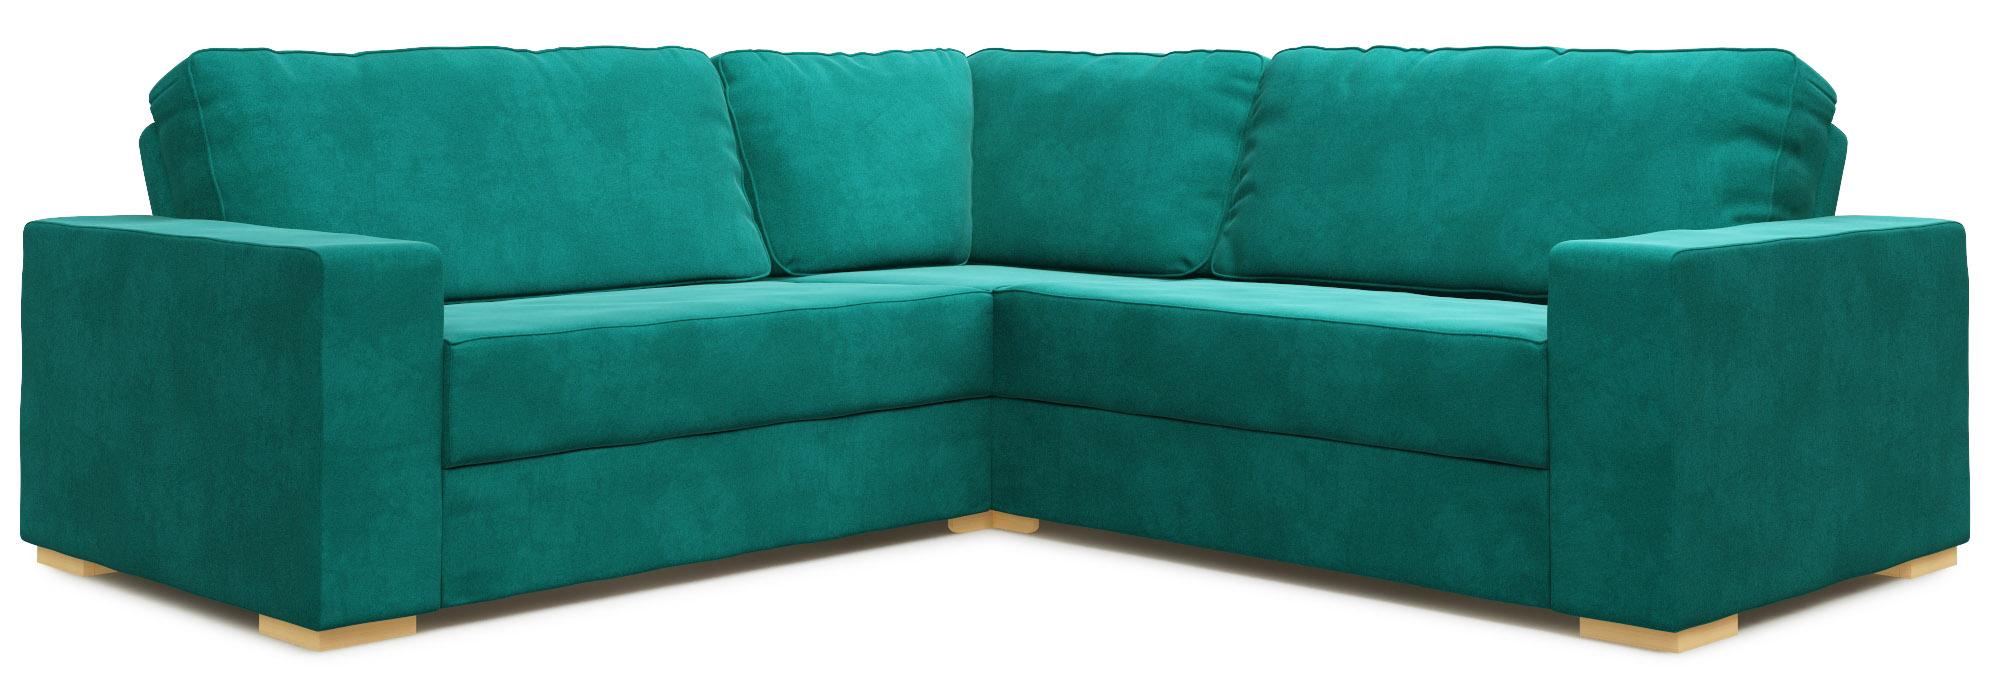 Xia 2X2 Corner Sofa